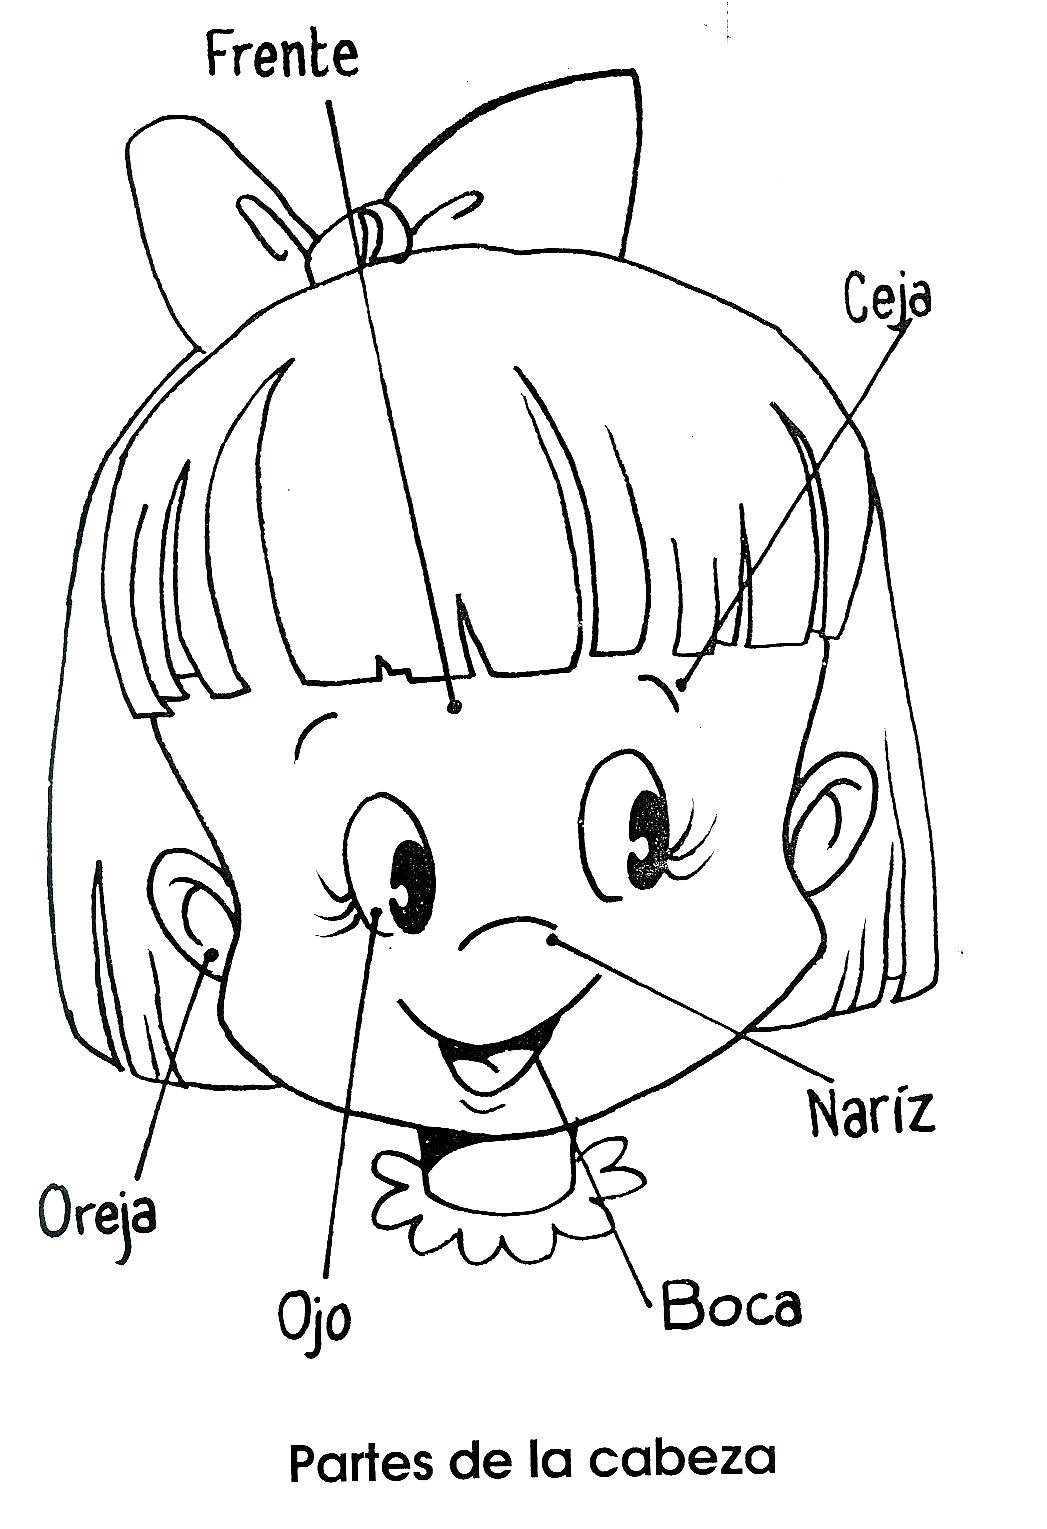 Dibujos En La Cara Para Nios. Top Cara De Dibujos Animados Kawaii ...